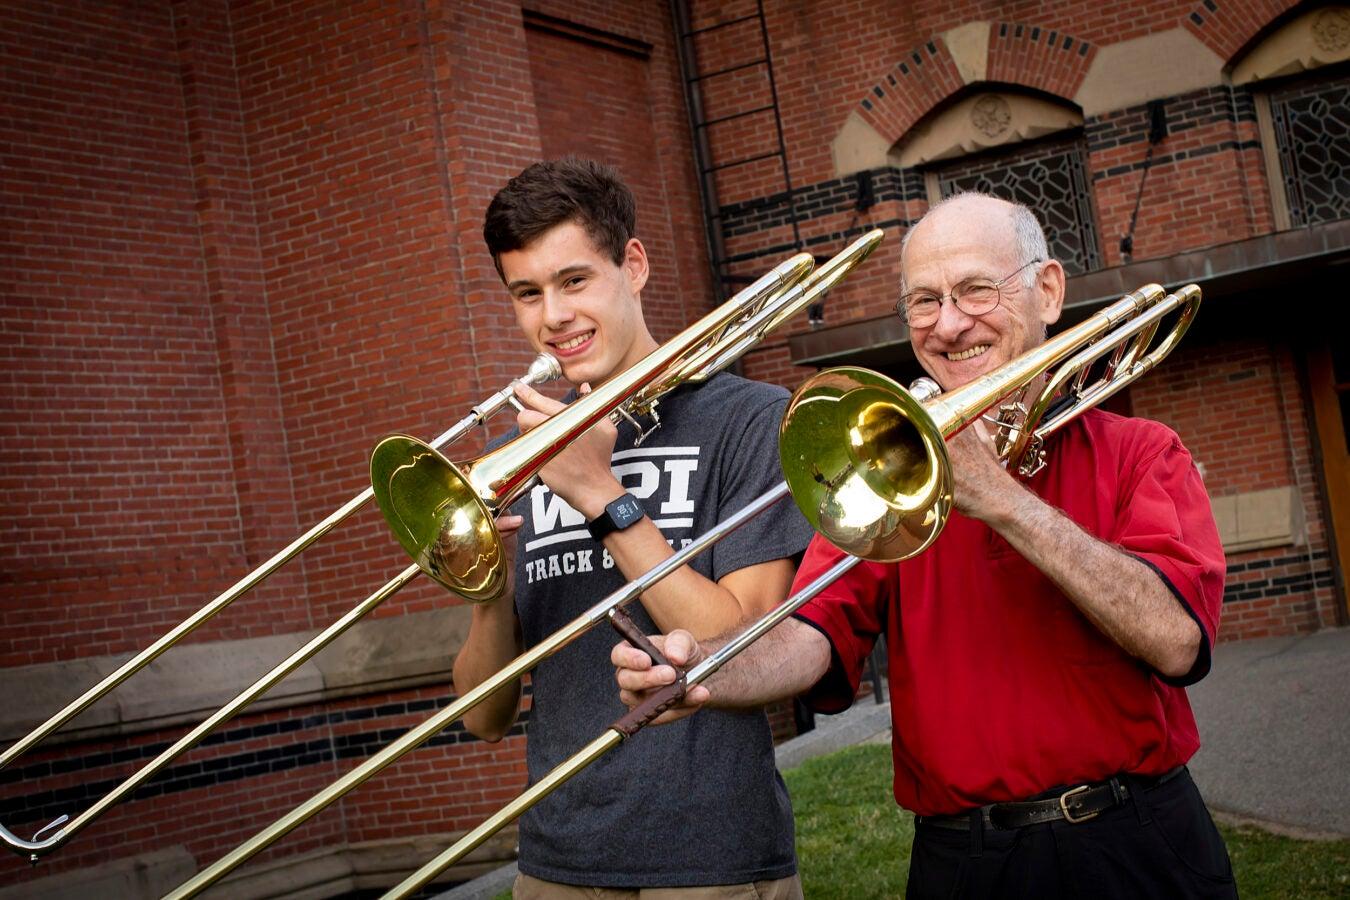 Andrew Yatsushashi, plays trombone as does, David Schwartz.